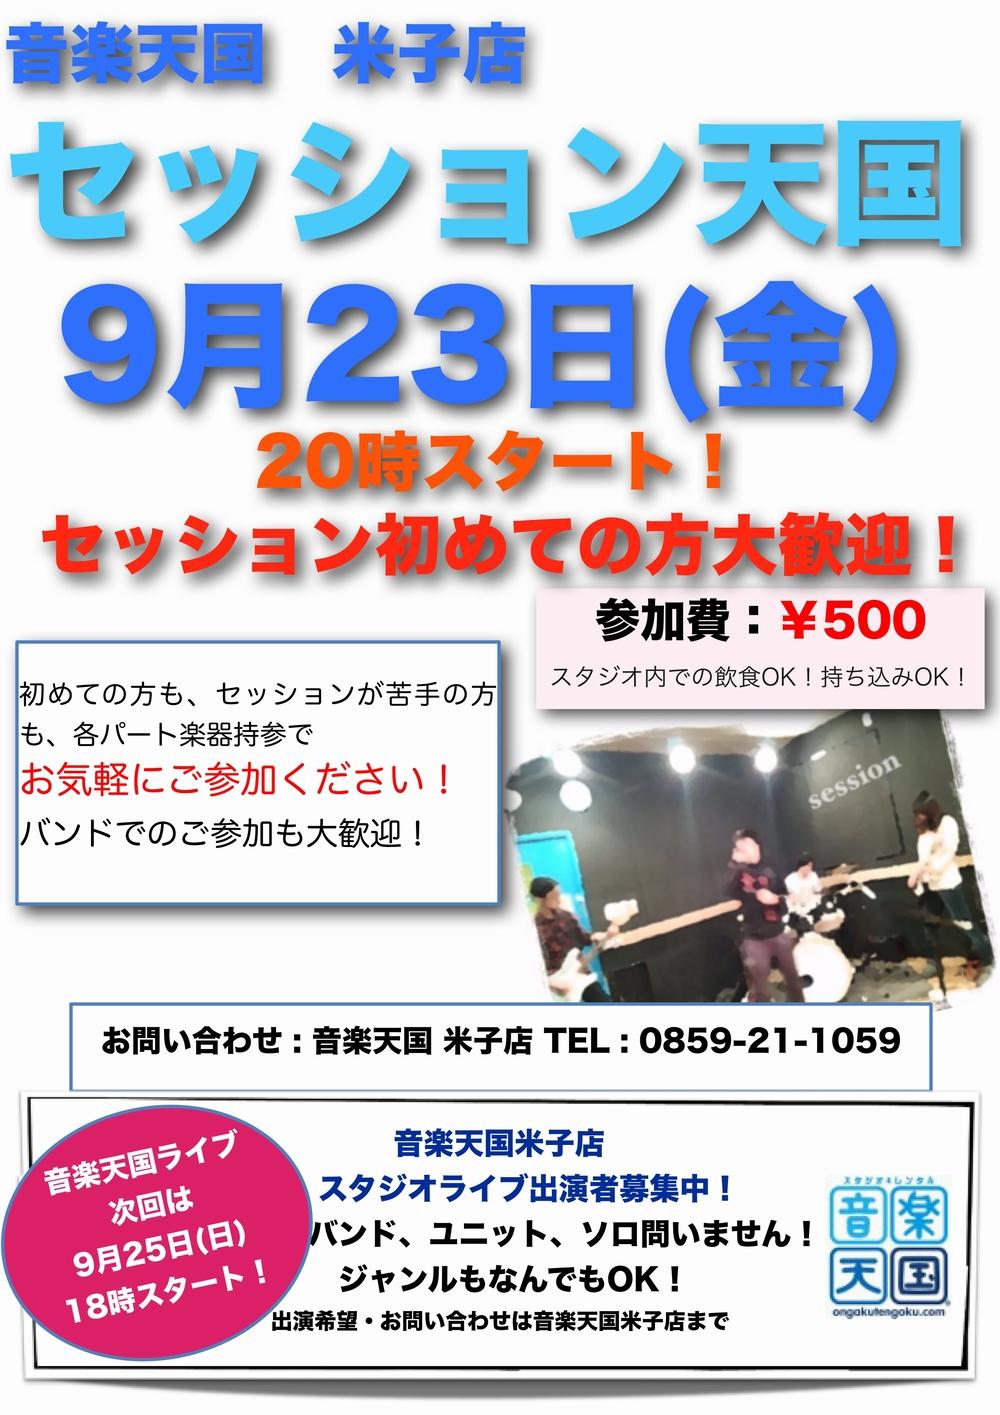 【セッション天国】音楽天国・米子FS店9月23日(金)開催